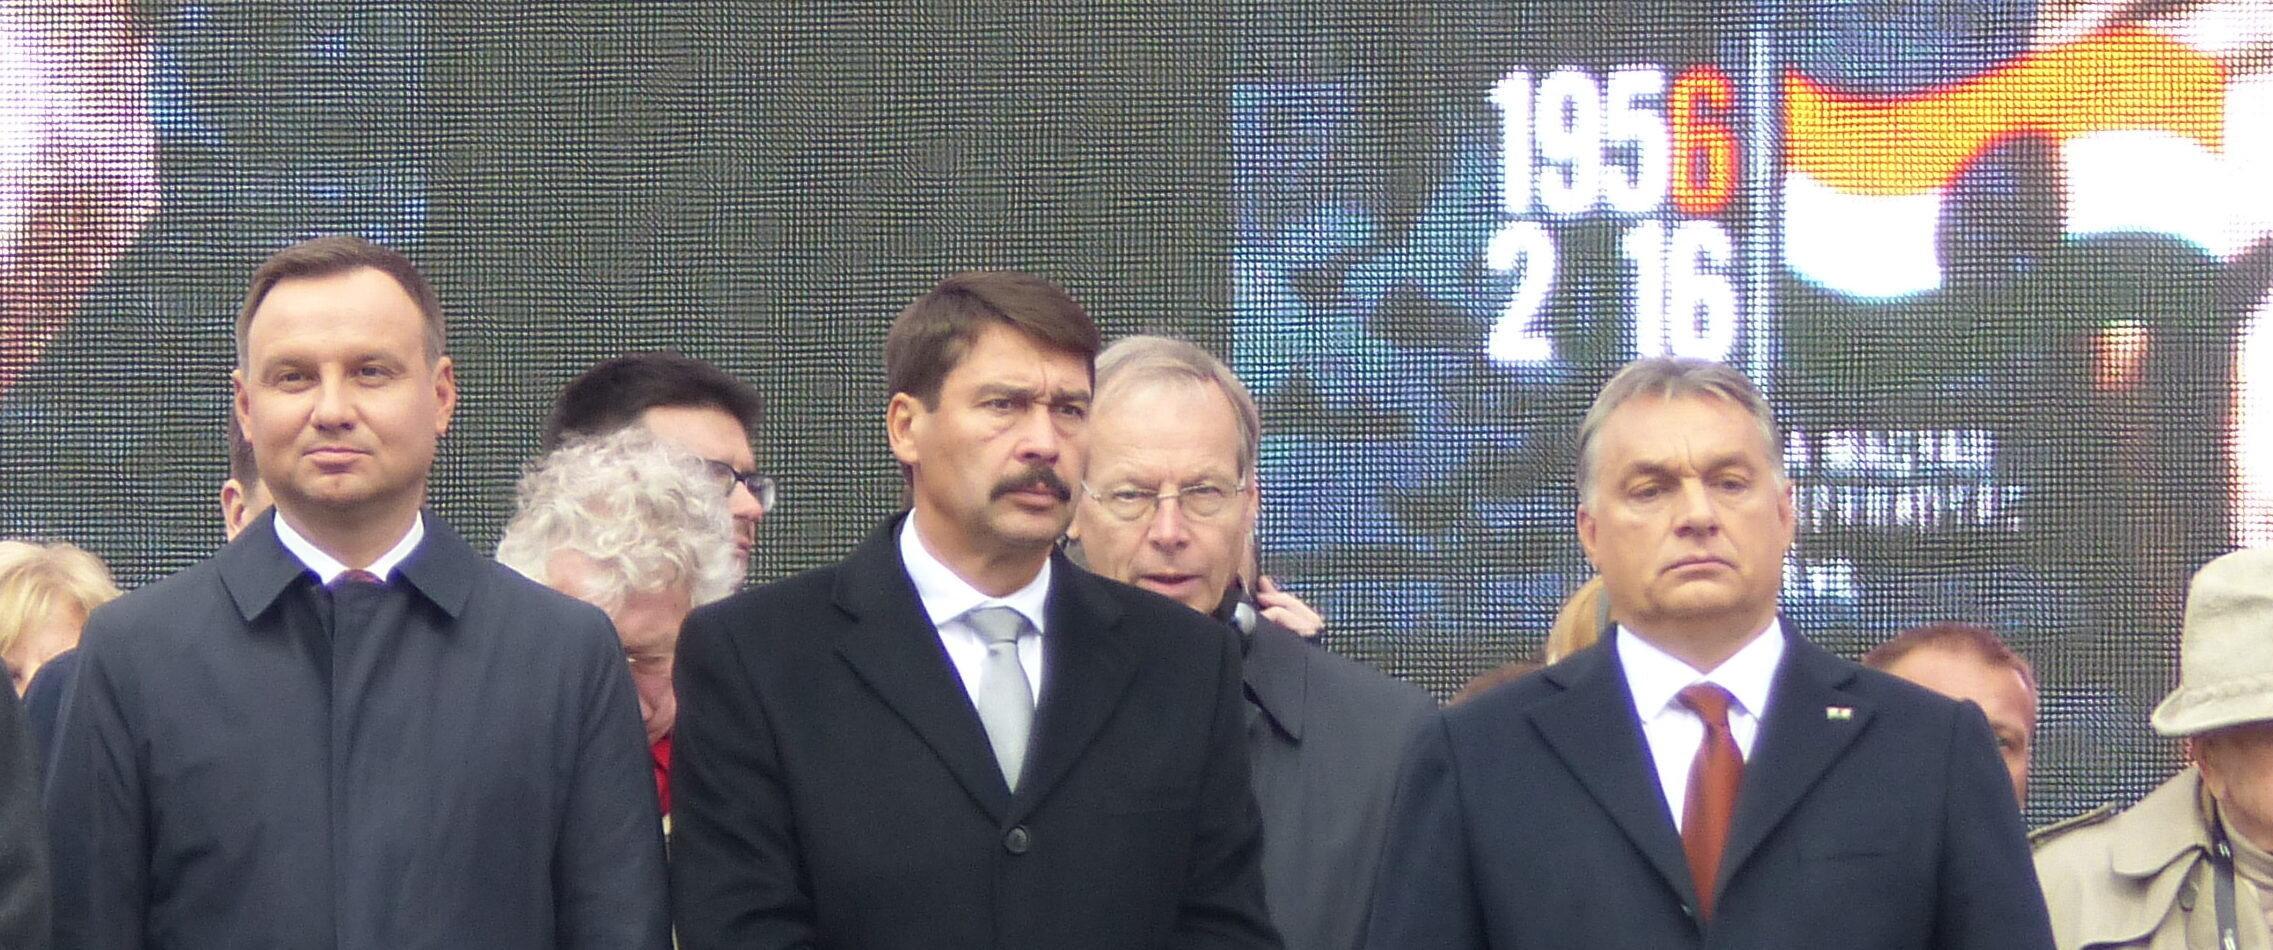 Andrzej_Duda_Orbán_Viktor_Áder_János_Kövér_László-1-e1570121736462.jpg